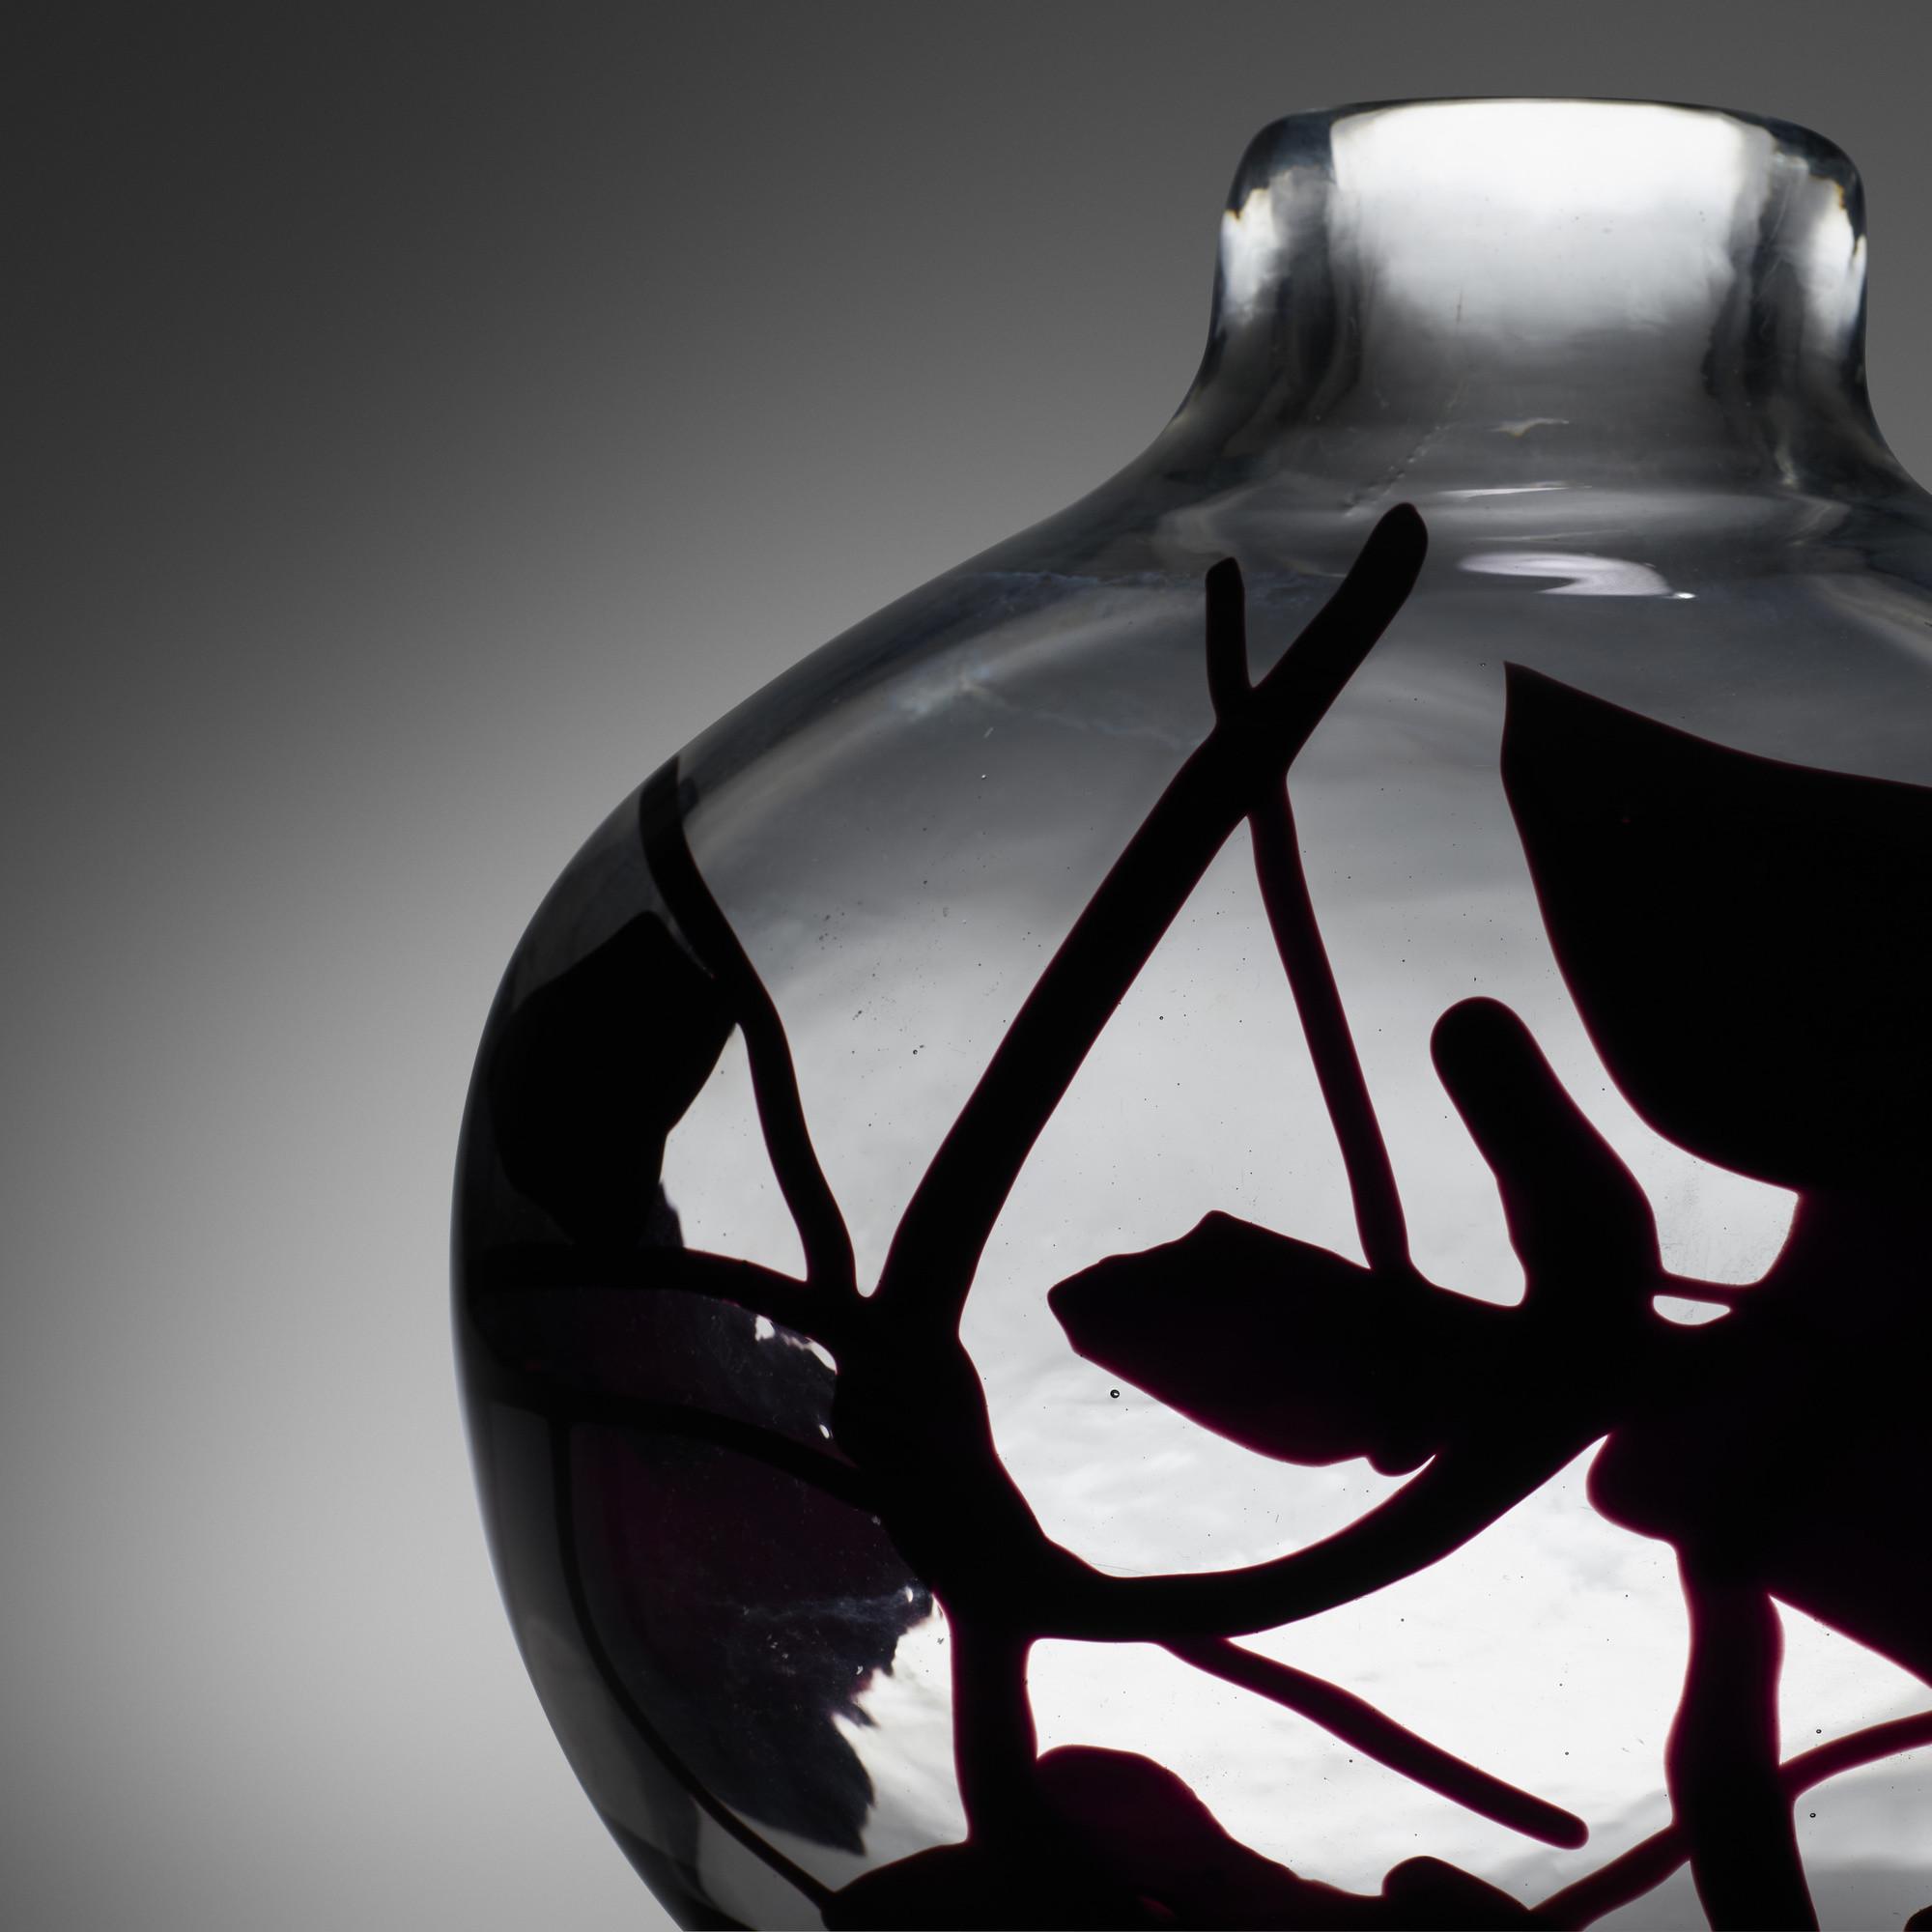 large black vases for sale of 139 fulvio bianconi important con macchie vase model 4324 regarding 139 fulvio bianconi important con macchie vase model 4324 3 of 4